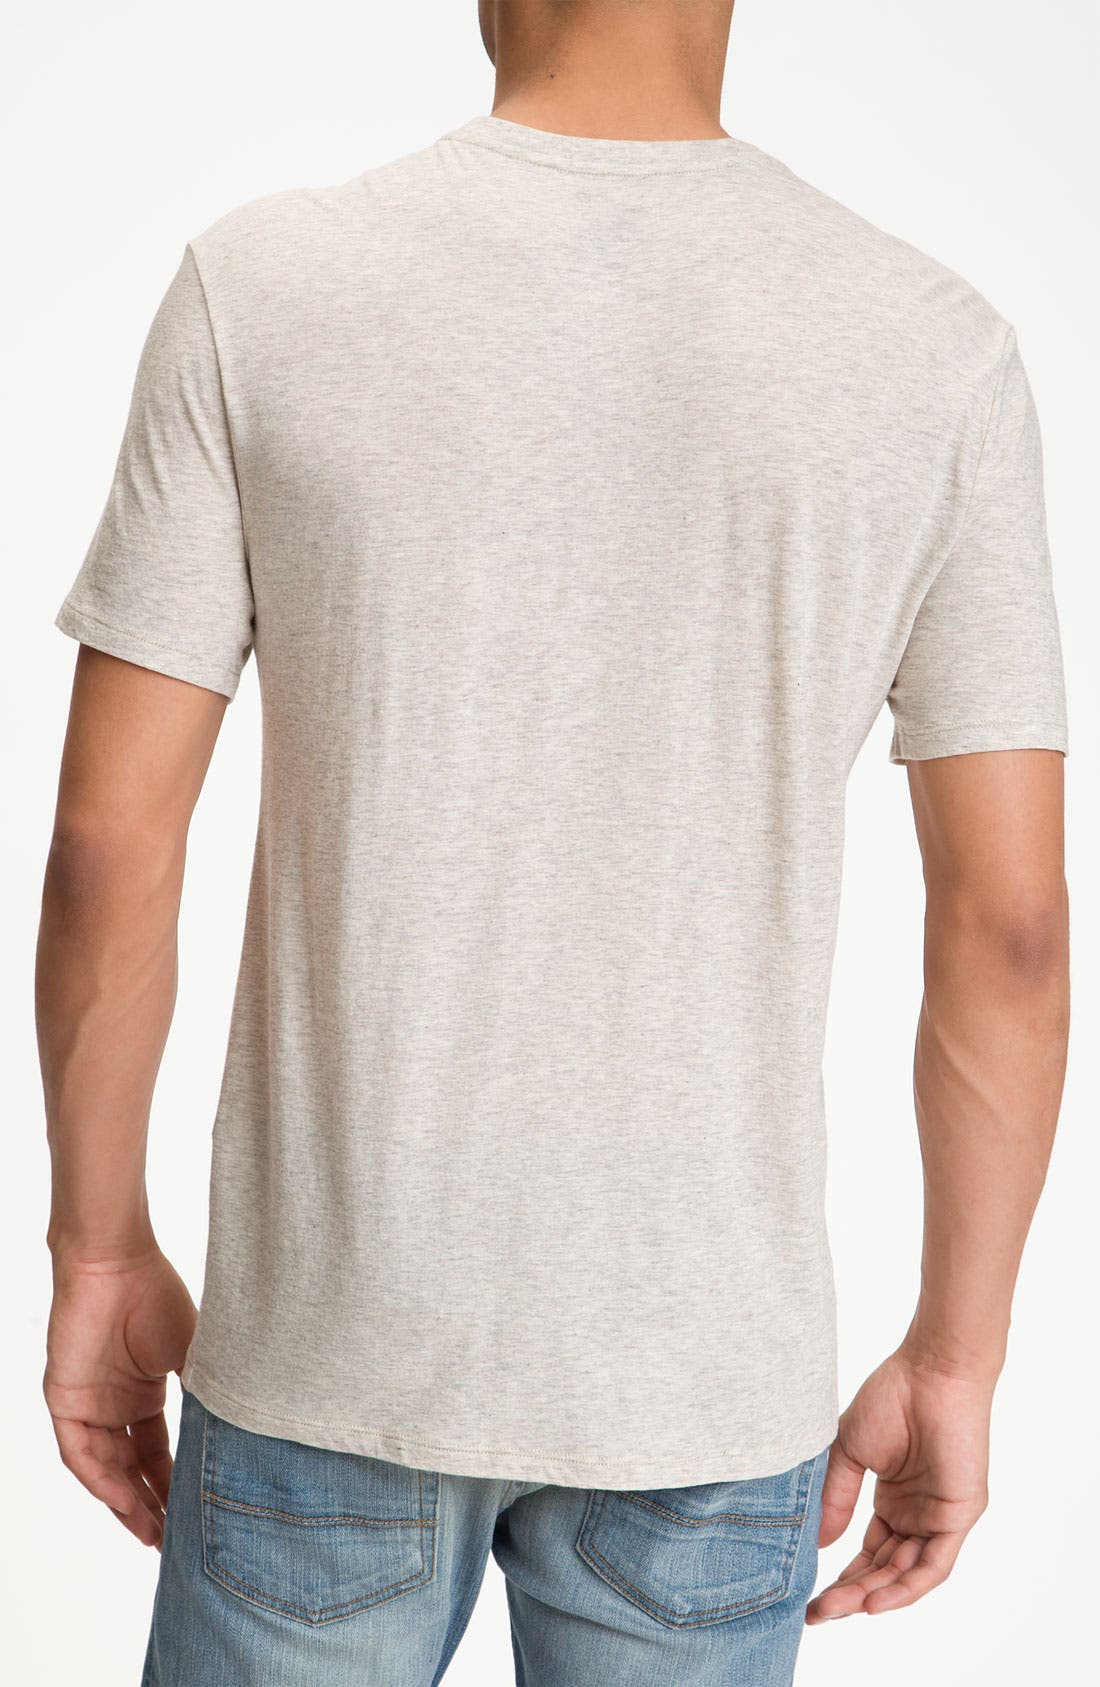 Alternate Image 2  - Vince Short Sleeve V-Neck T-Shirt